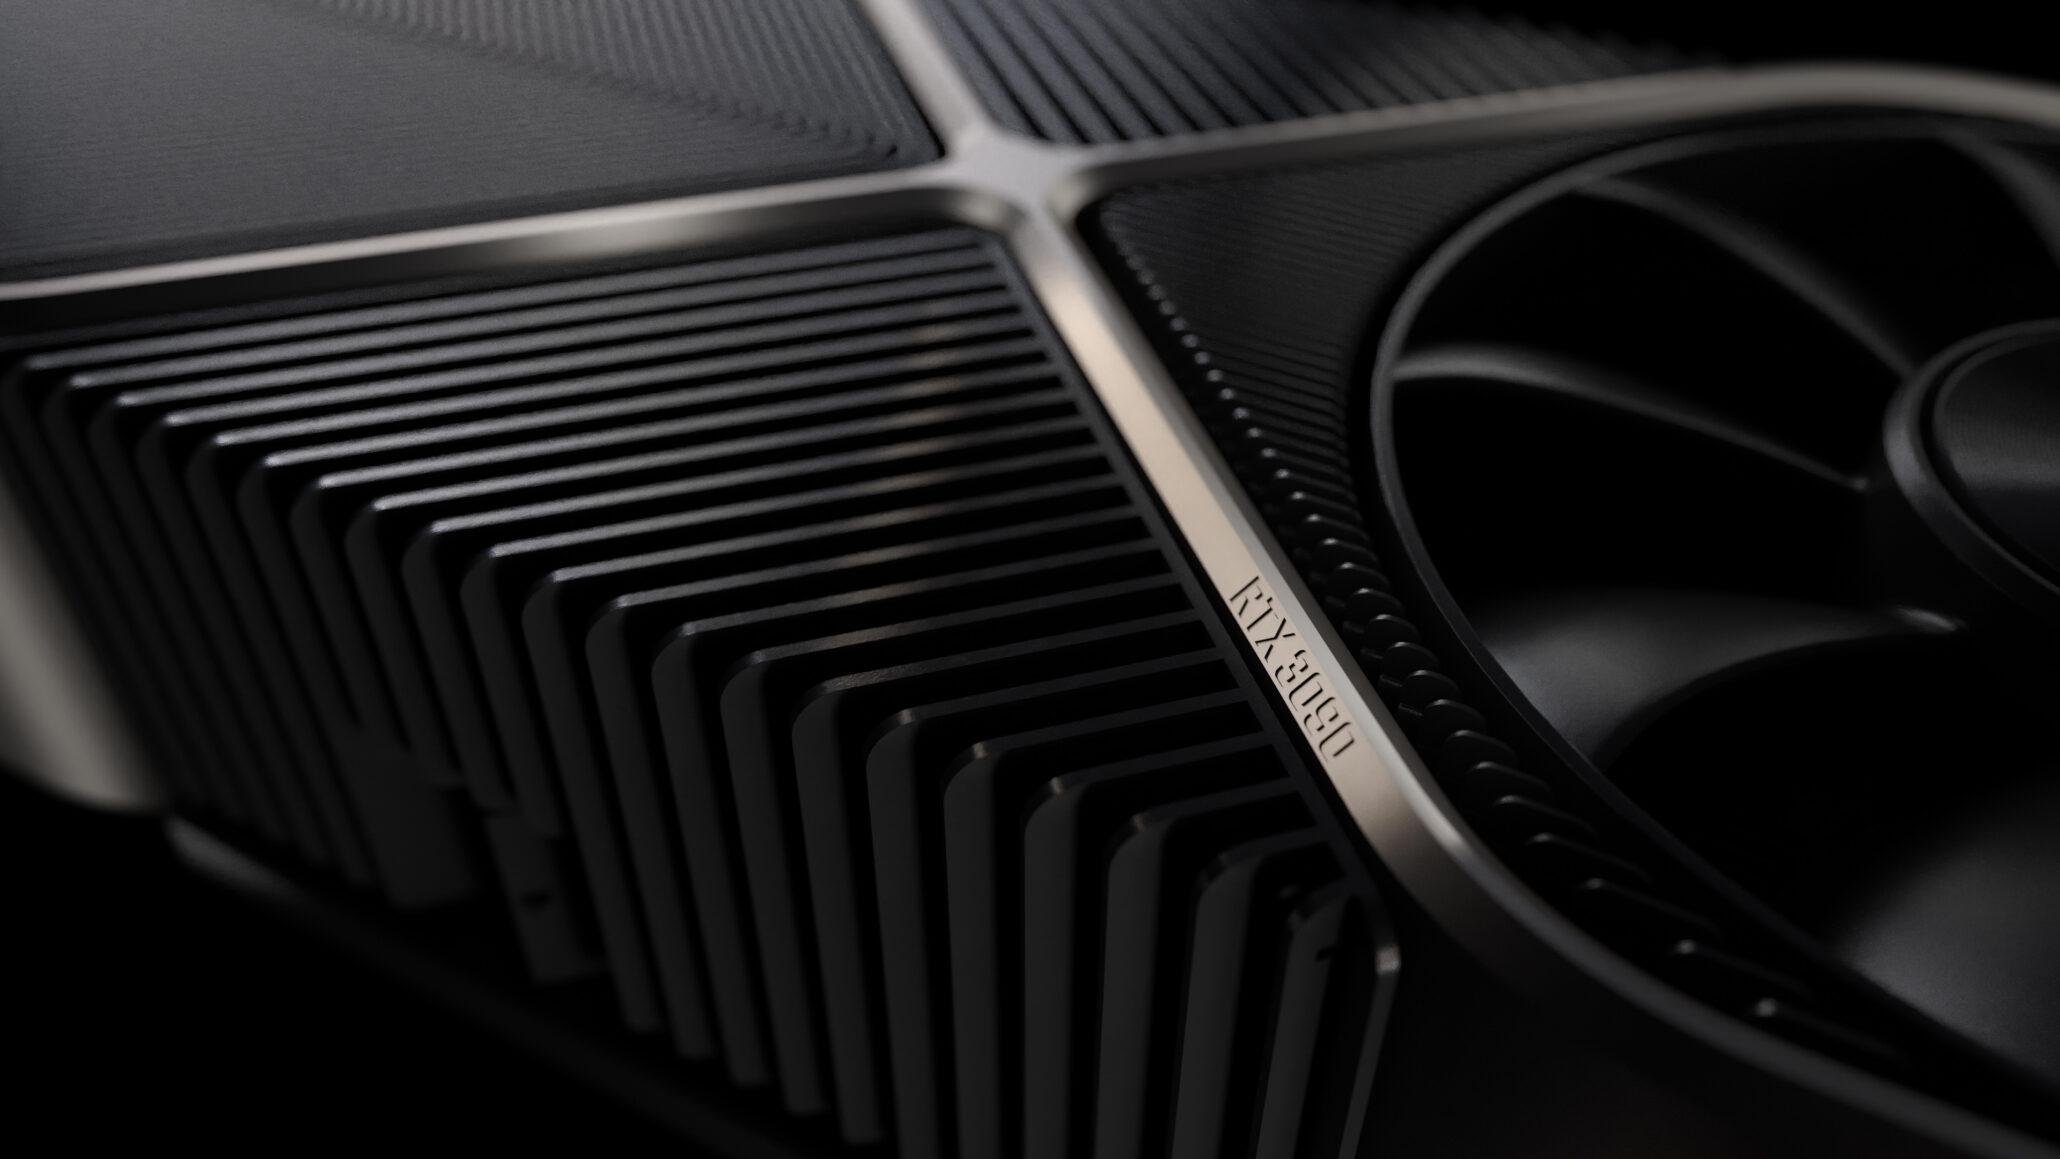 NVIDIA GeForce RTX 3090 Ultra-Enthusiast Graphics Card Benchmarks Bocor, Hingga 50% Lebih Cepat Dari RTX 2080 Ti dalam 3DMark